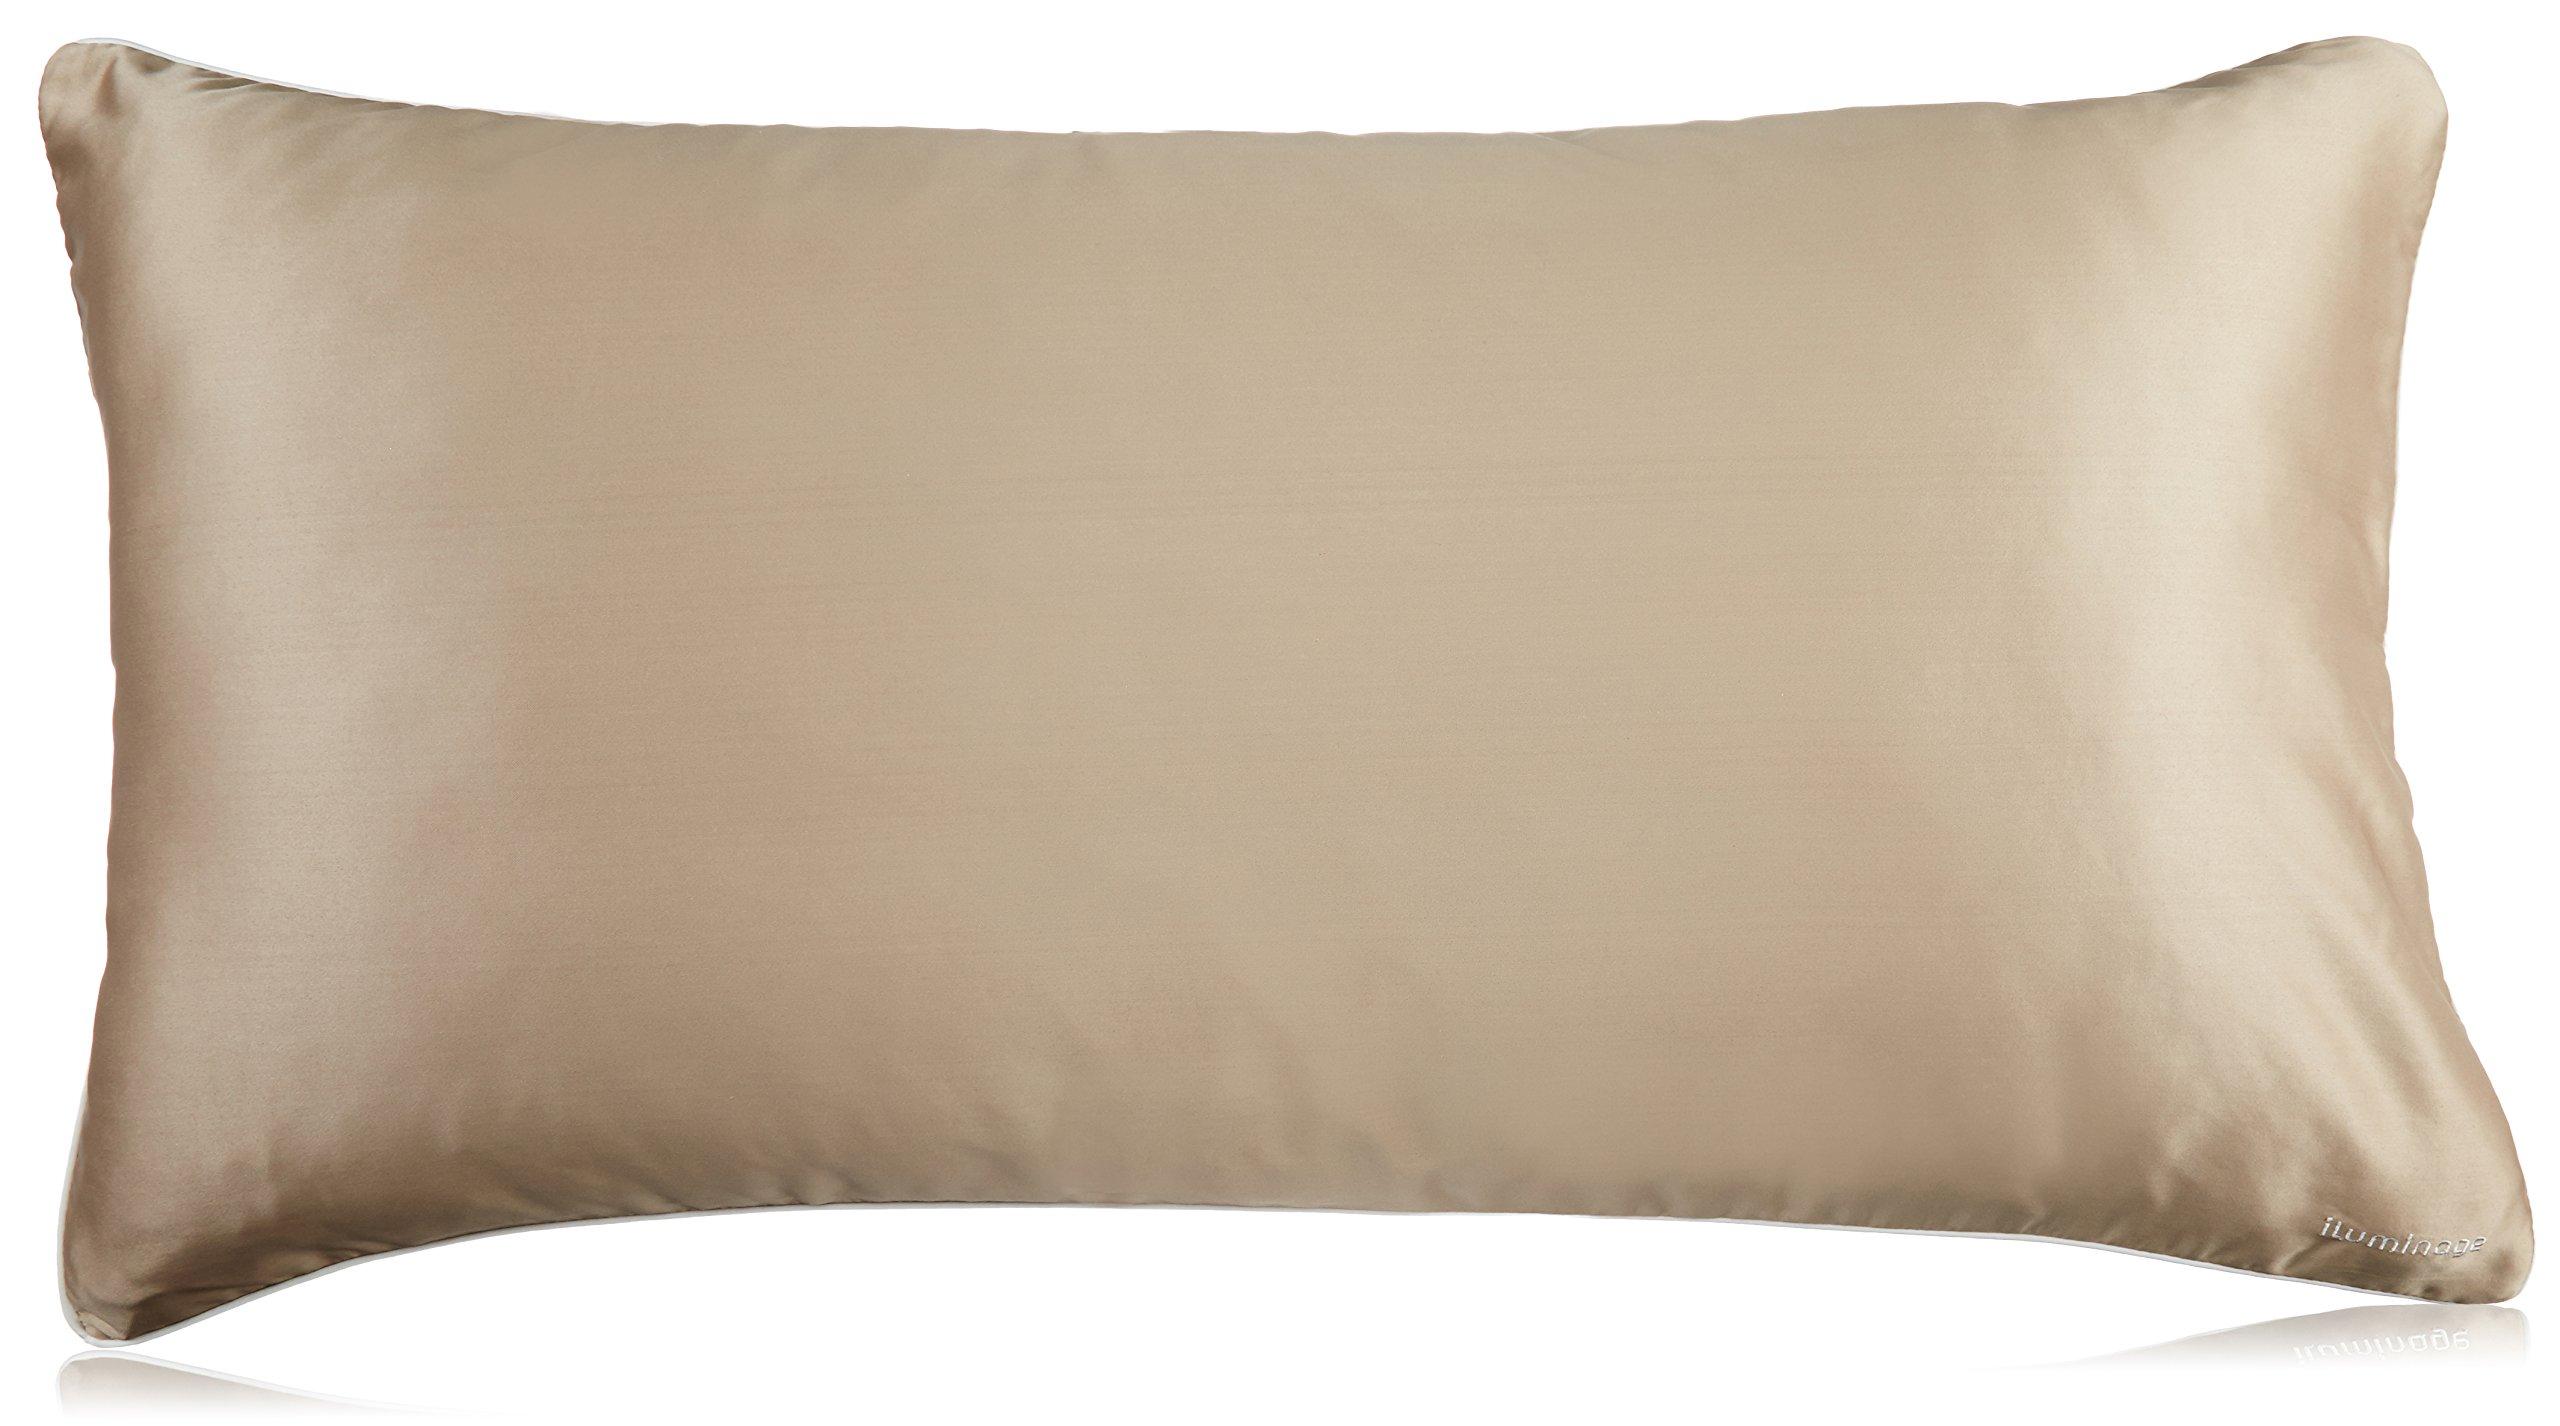 iluminage Skin Rejuvenating Pillowcase with Copper Oxide